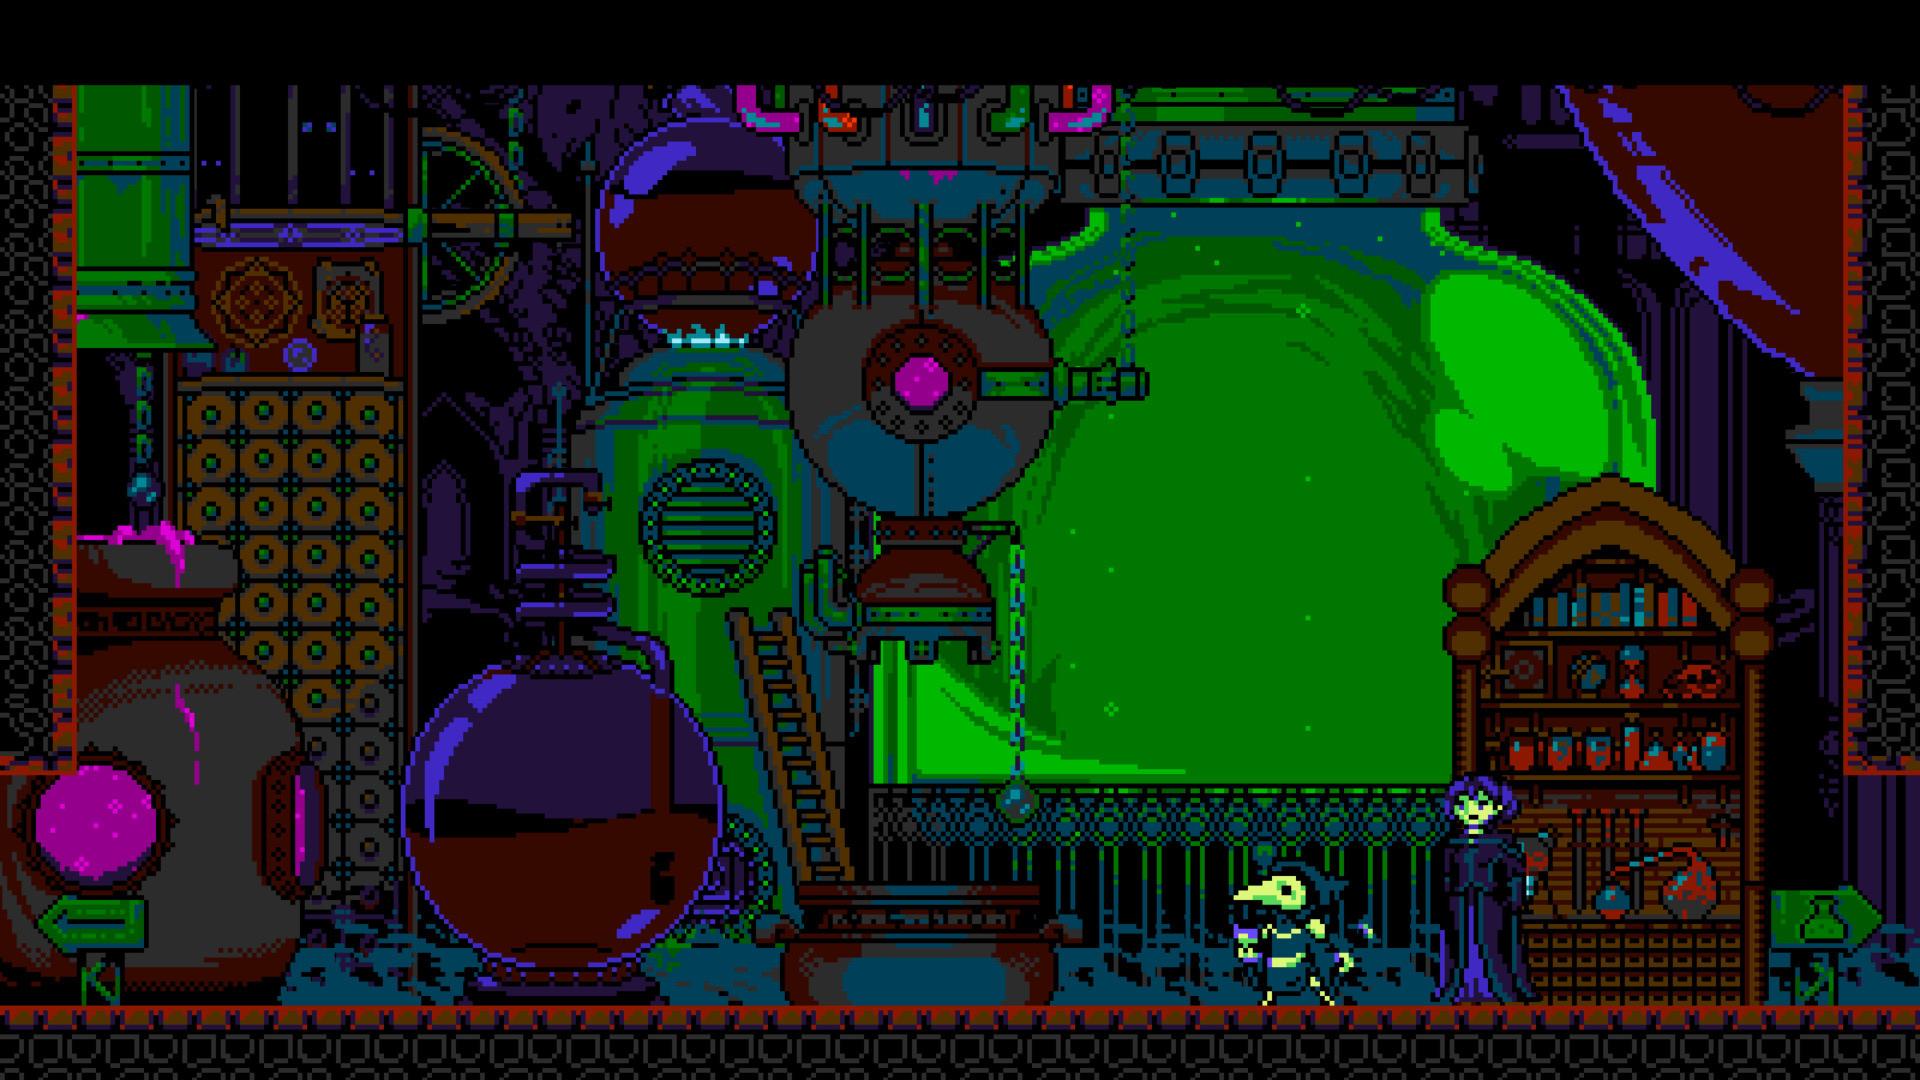 Res: 1920x1080, Shovel Knight, Video Games, Pixel Art, 8 bit, 16 bit, Fantasy Art Wallpapers  HD / Desktop and Mobile Backgrounds